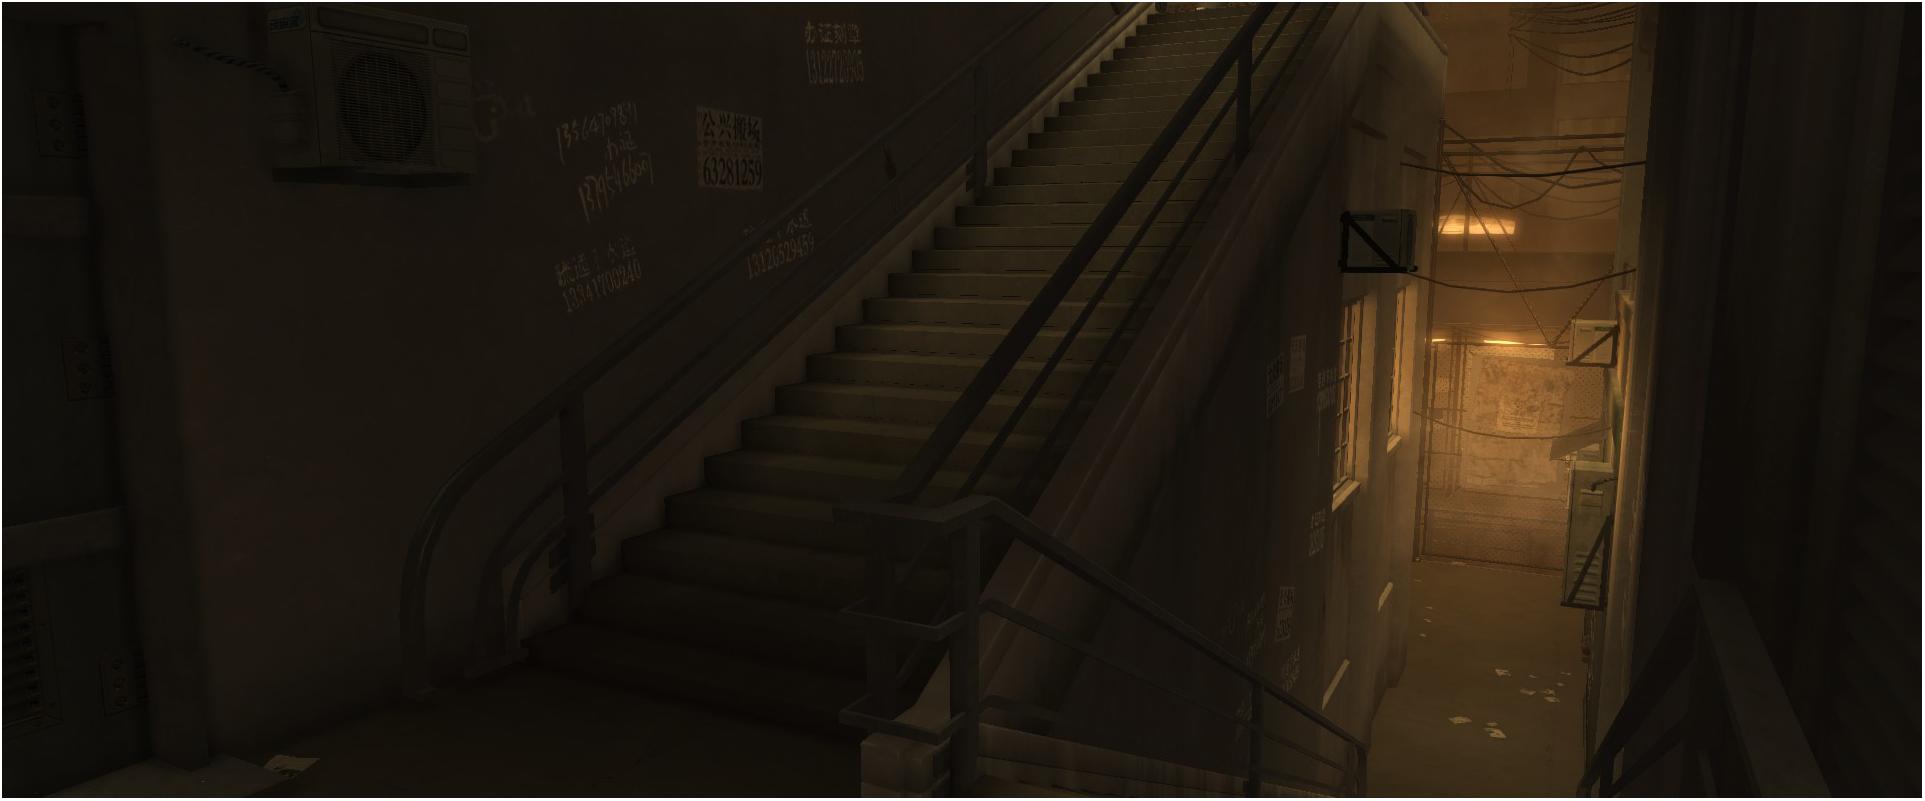 Deus Ex Human Revolution_0029_JTC.png